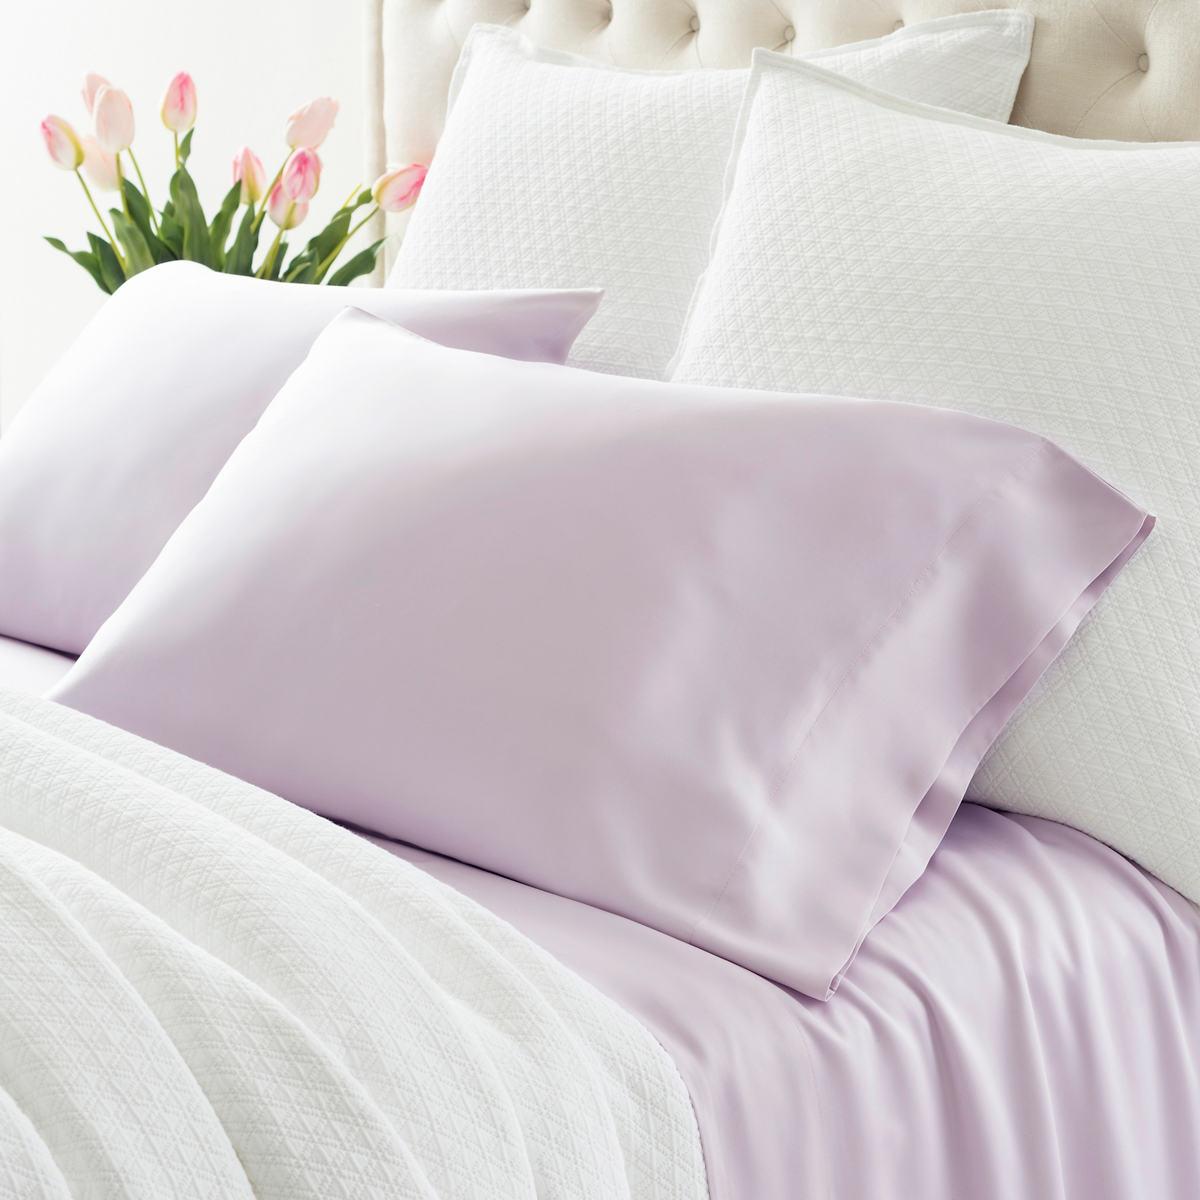 Silken Solid Pale Lilac Sheet Set